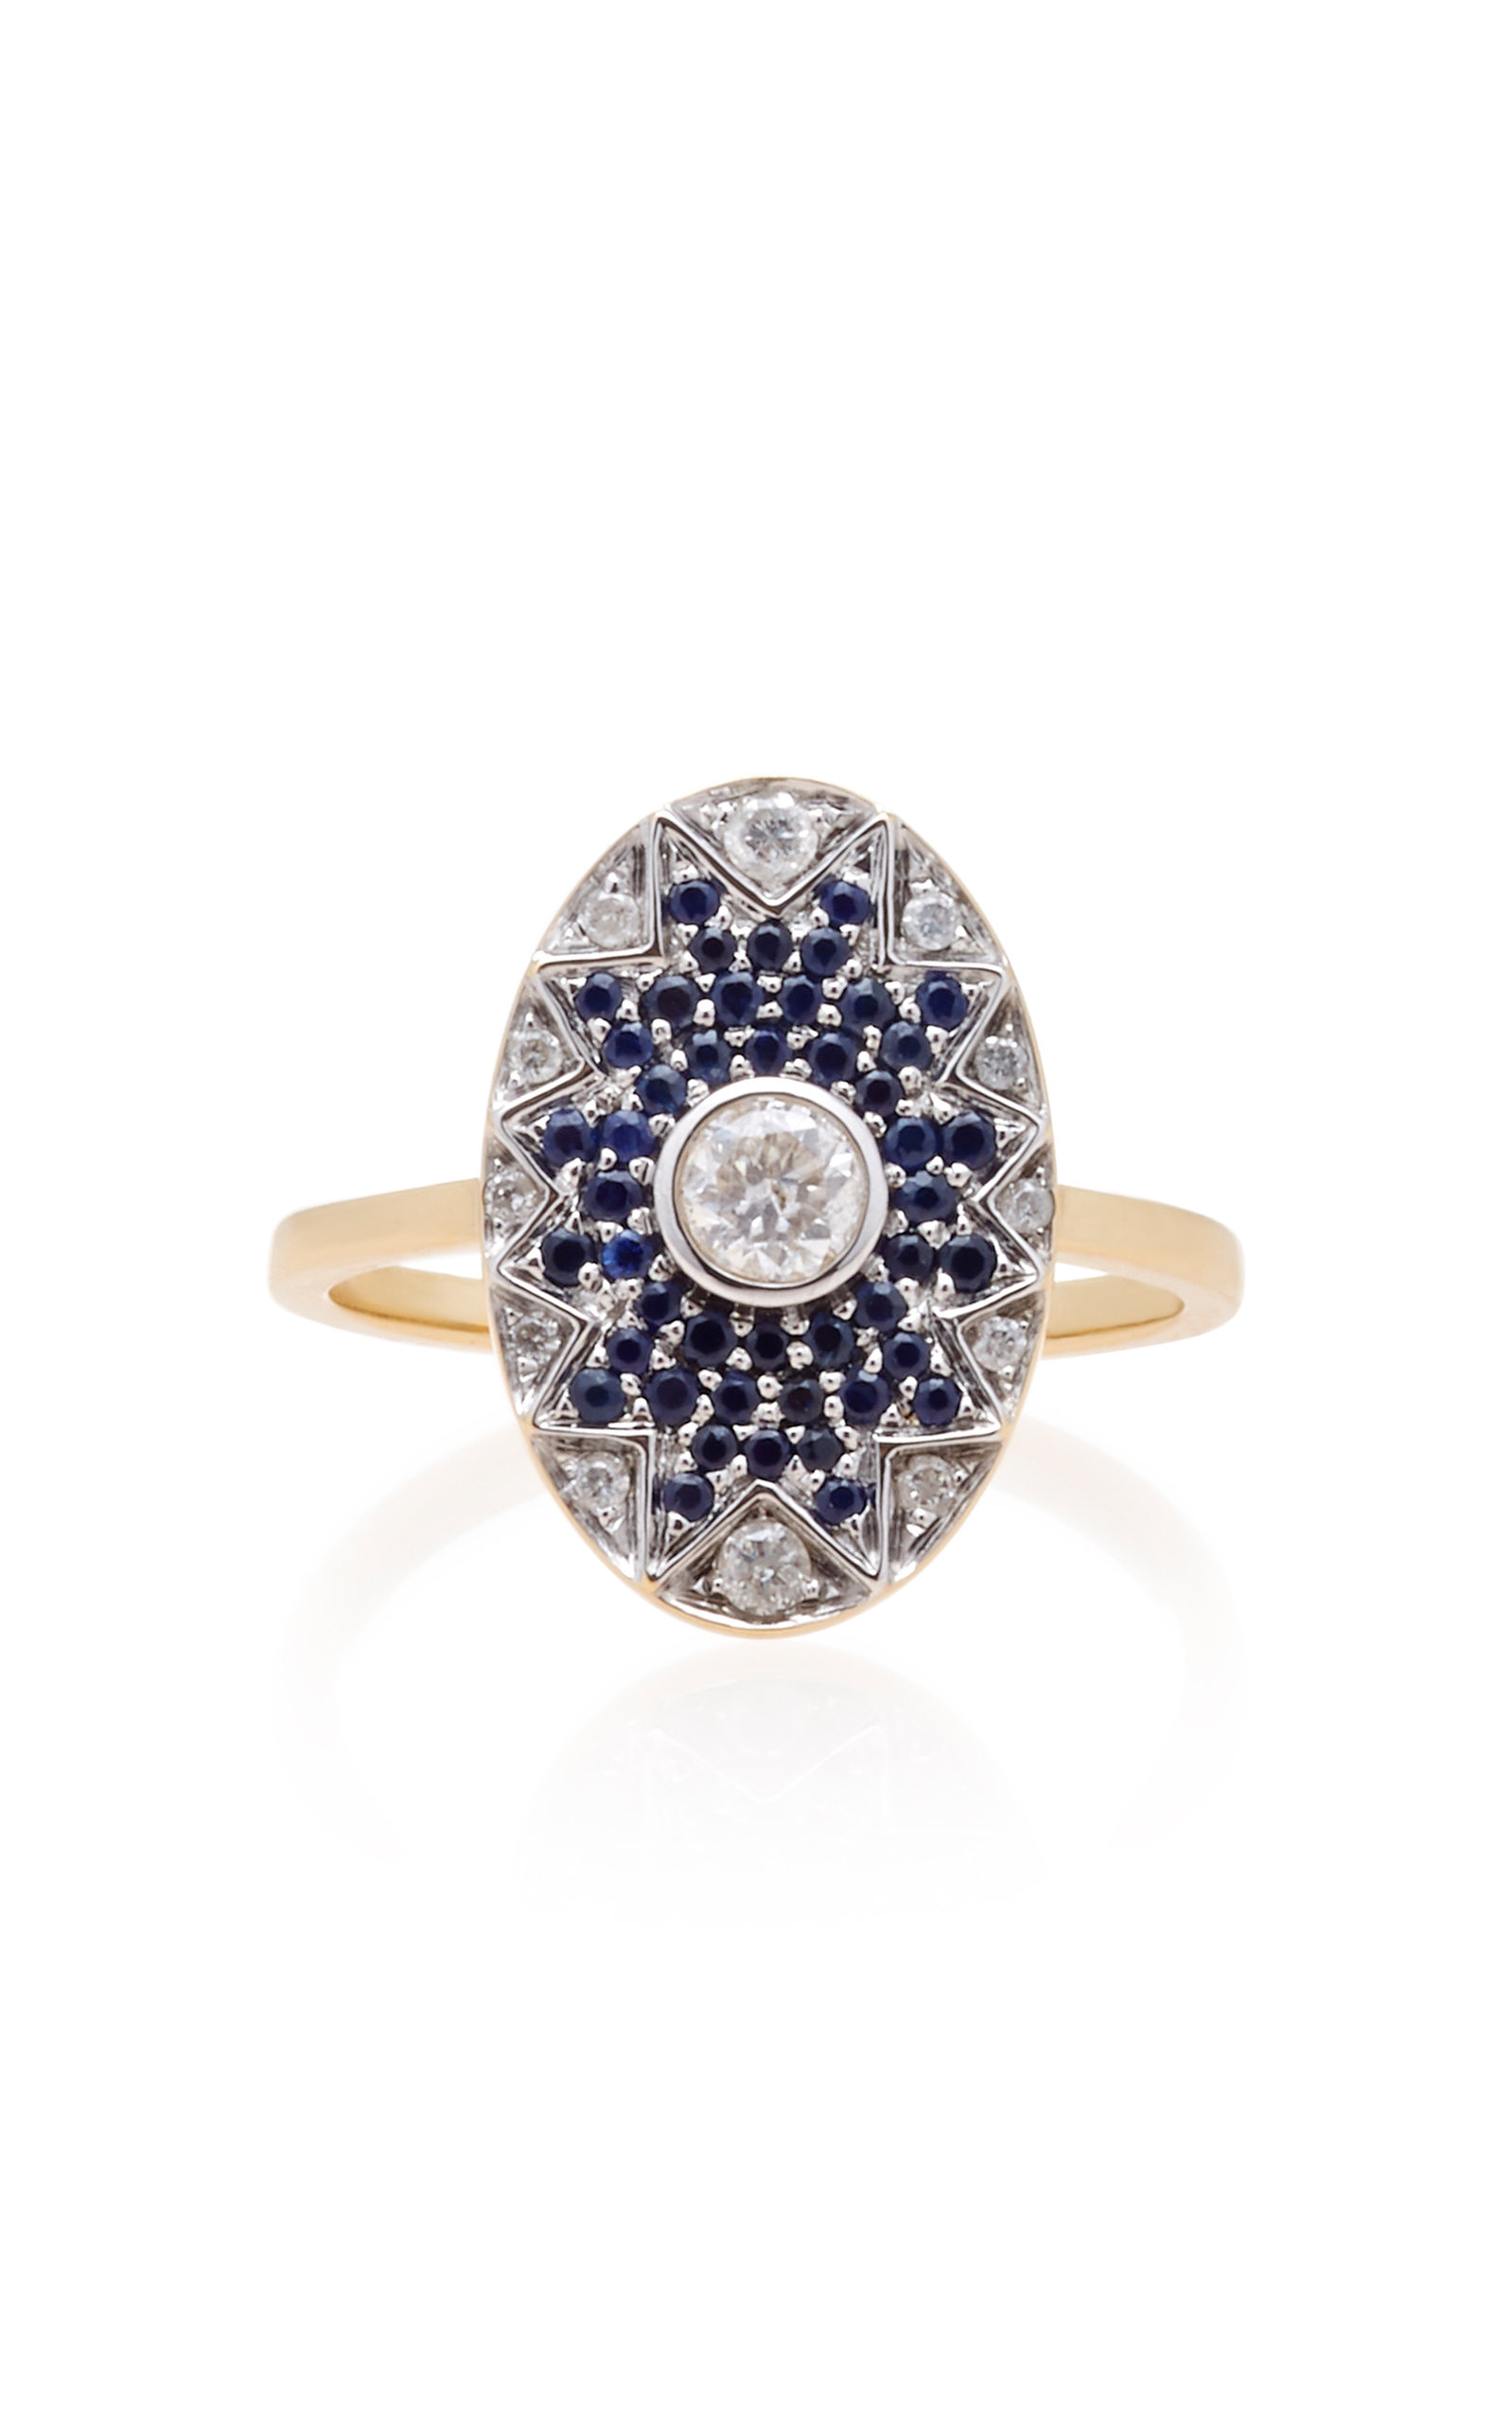 Yvonne Léon NAPOLEON STAR 18K GOLD, DIAMOND AND TSAVORITE RING SIZE: 7